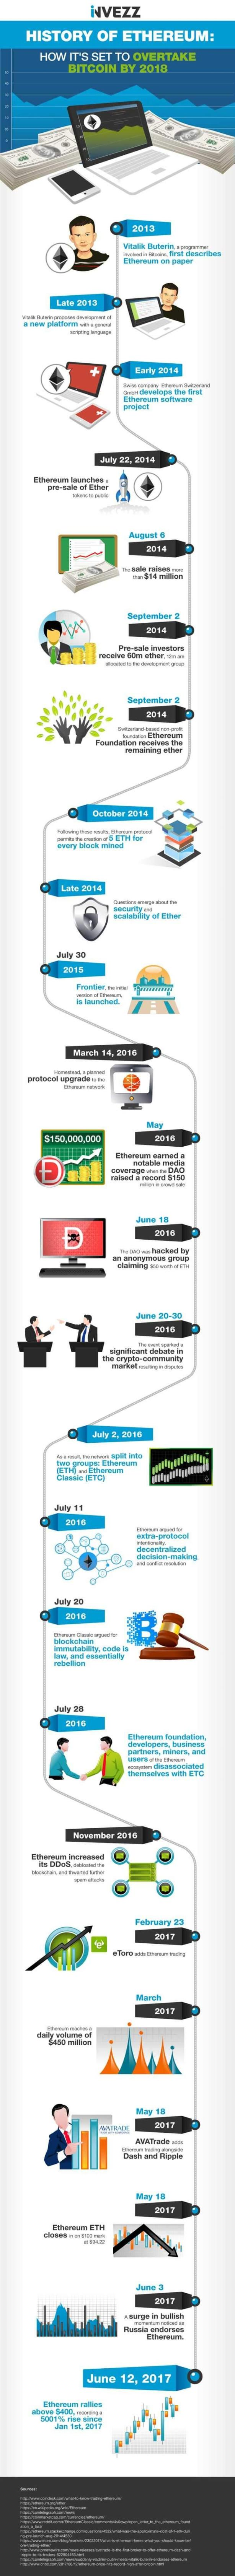 ethereum-infographic